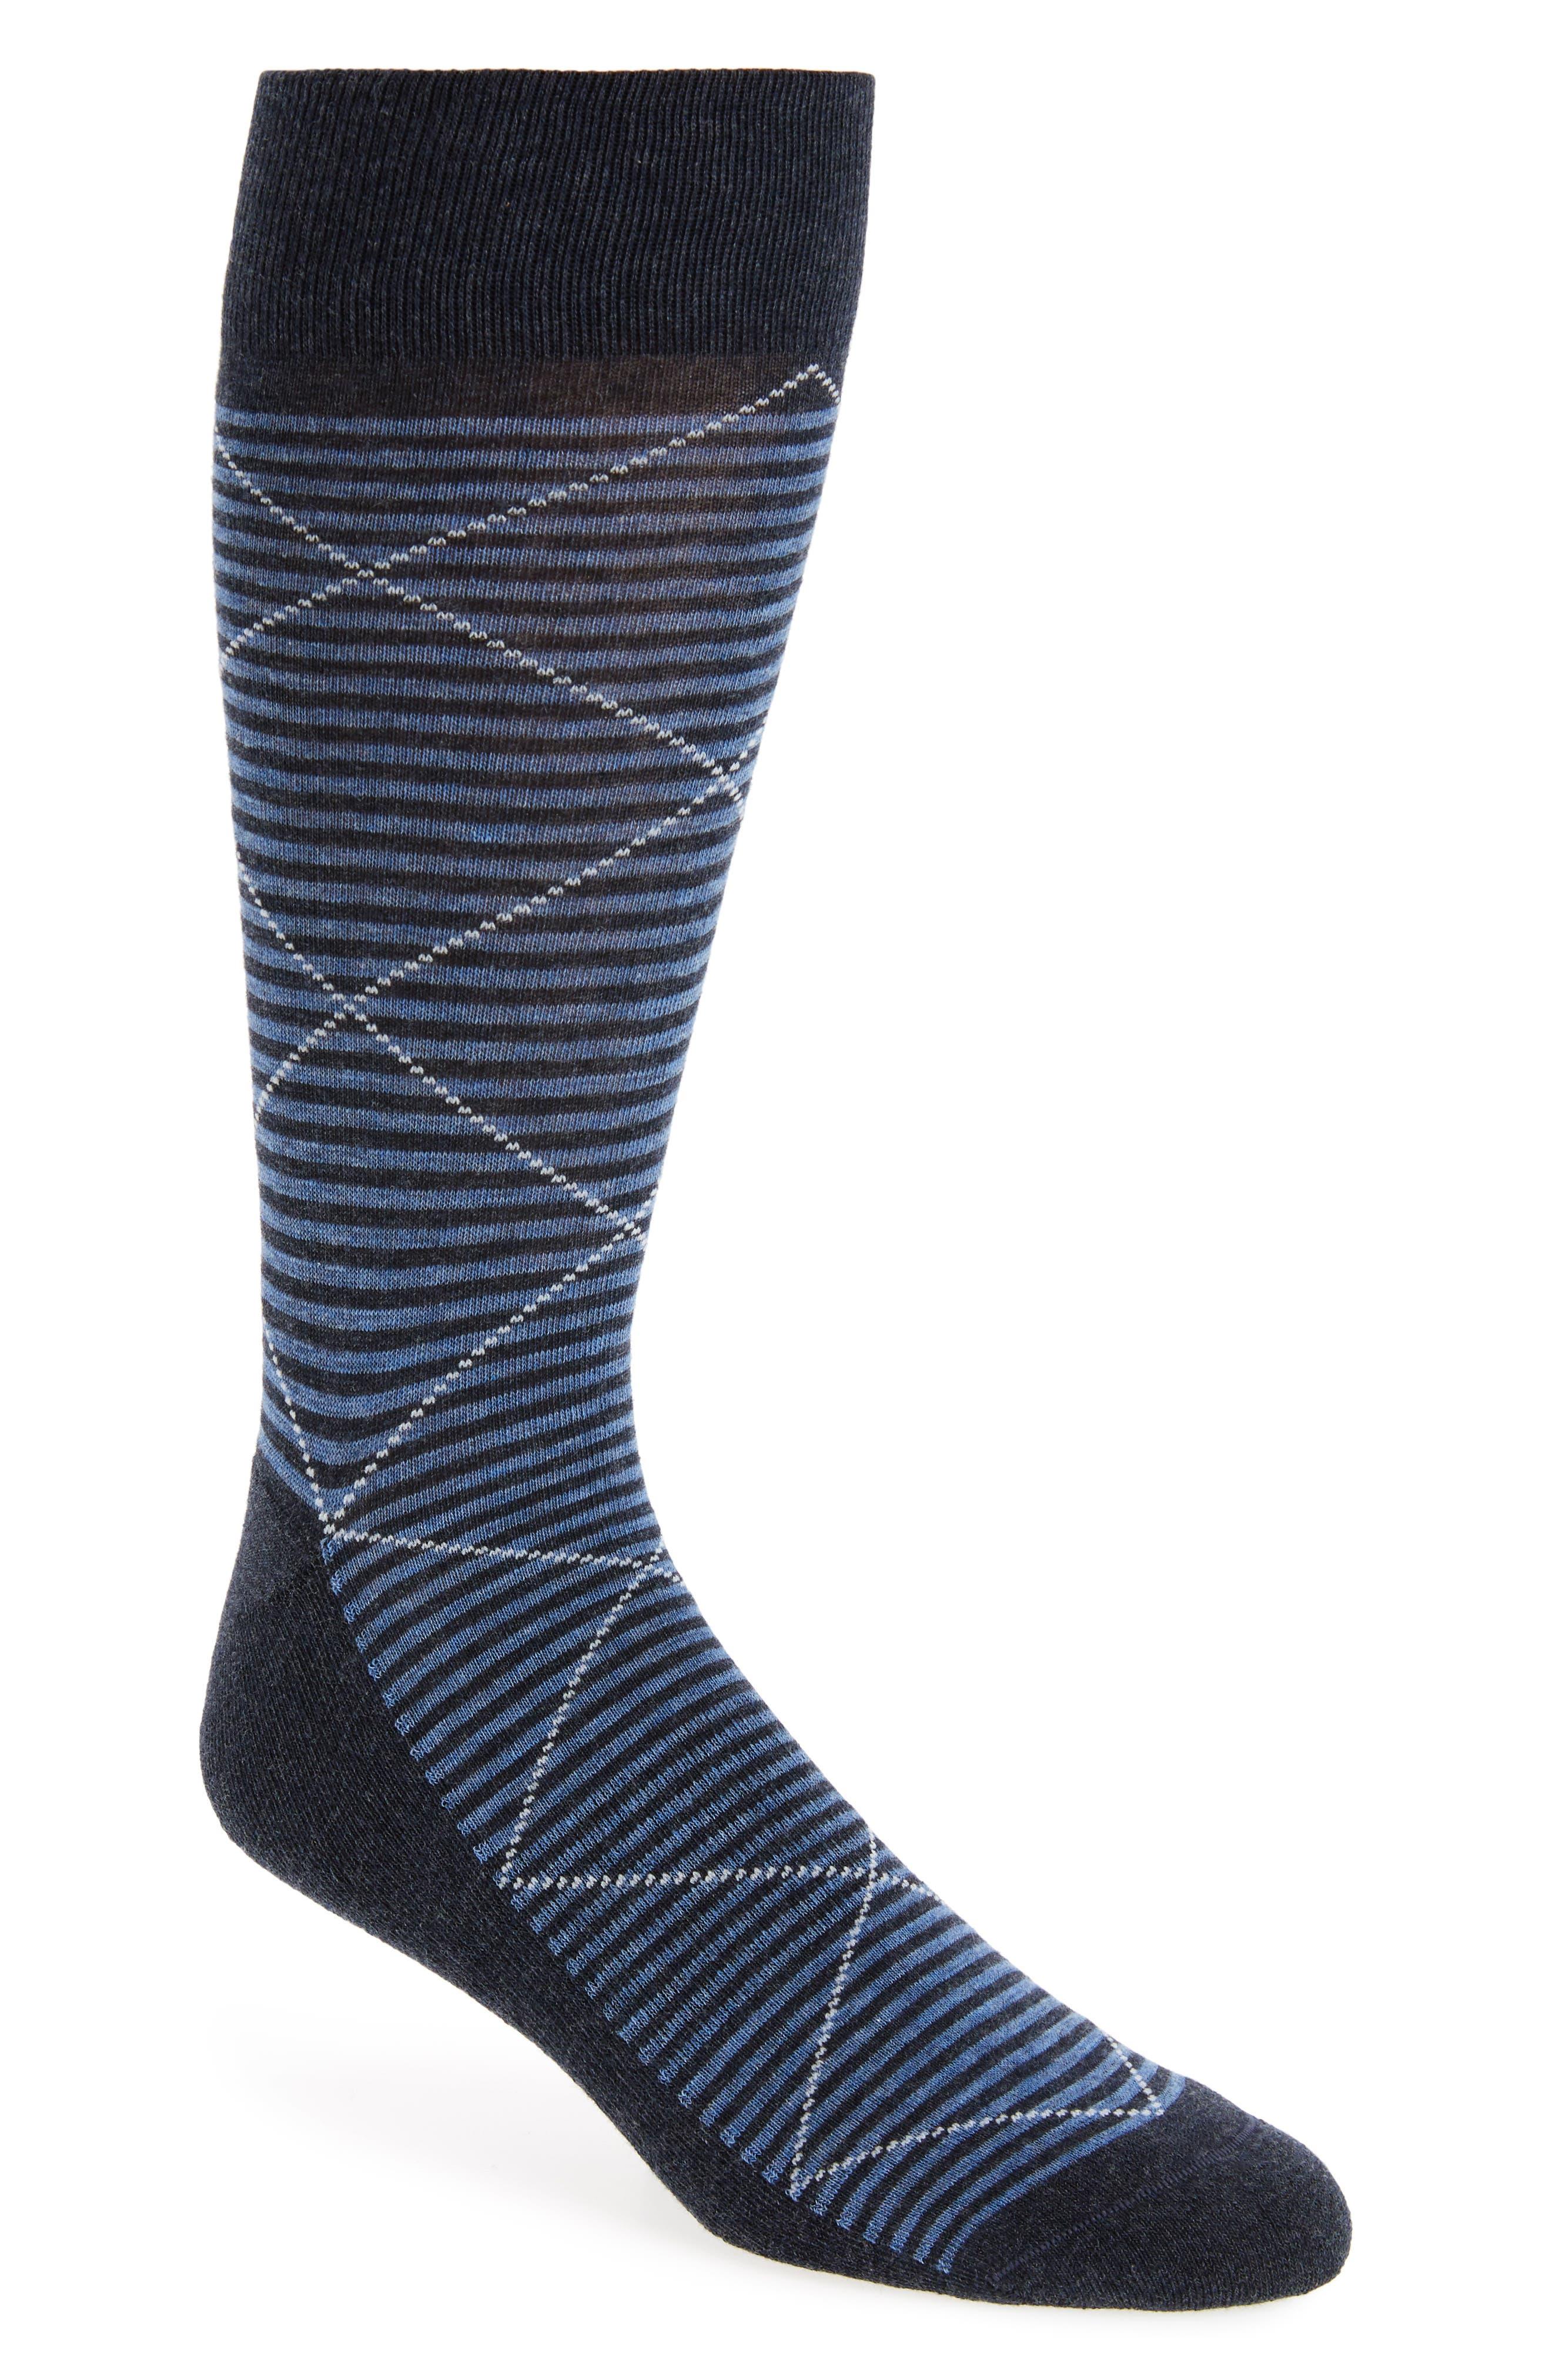 Alternate Image 1 Selected - Nordstrom Men's Shop Argyle Socks (3 for $30)